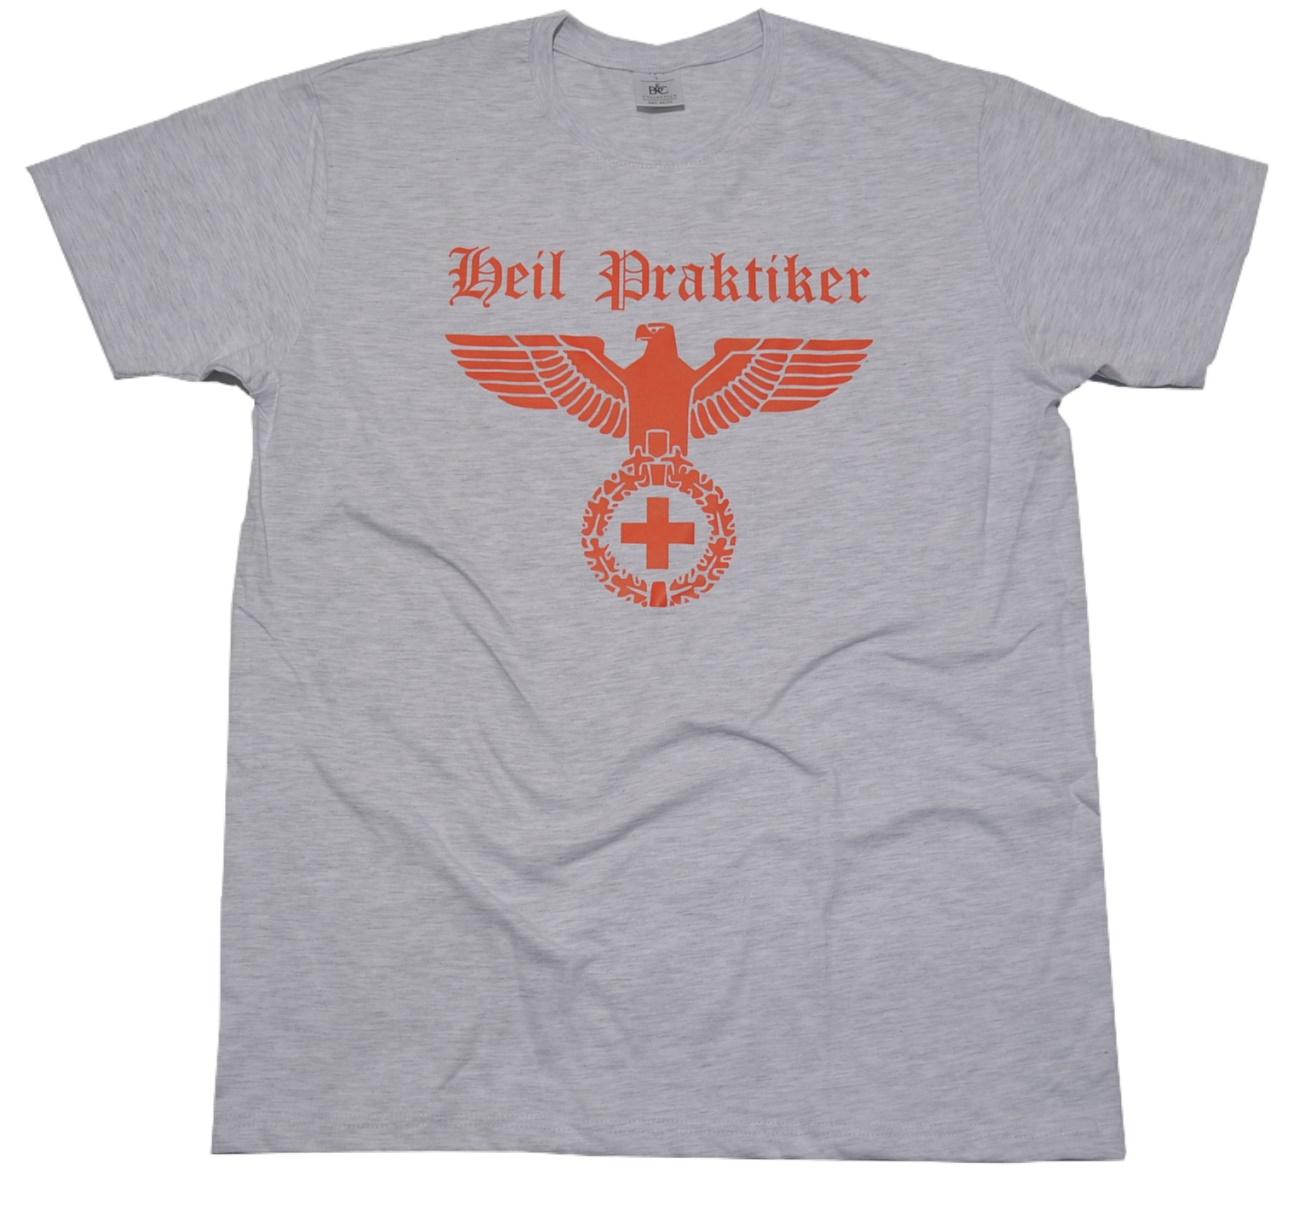 bf030b8db0d2a5 T-Shirt Heil Praktiker G430 - RAC T-Shirts - Rascal Streetwear ...